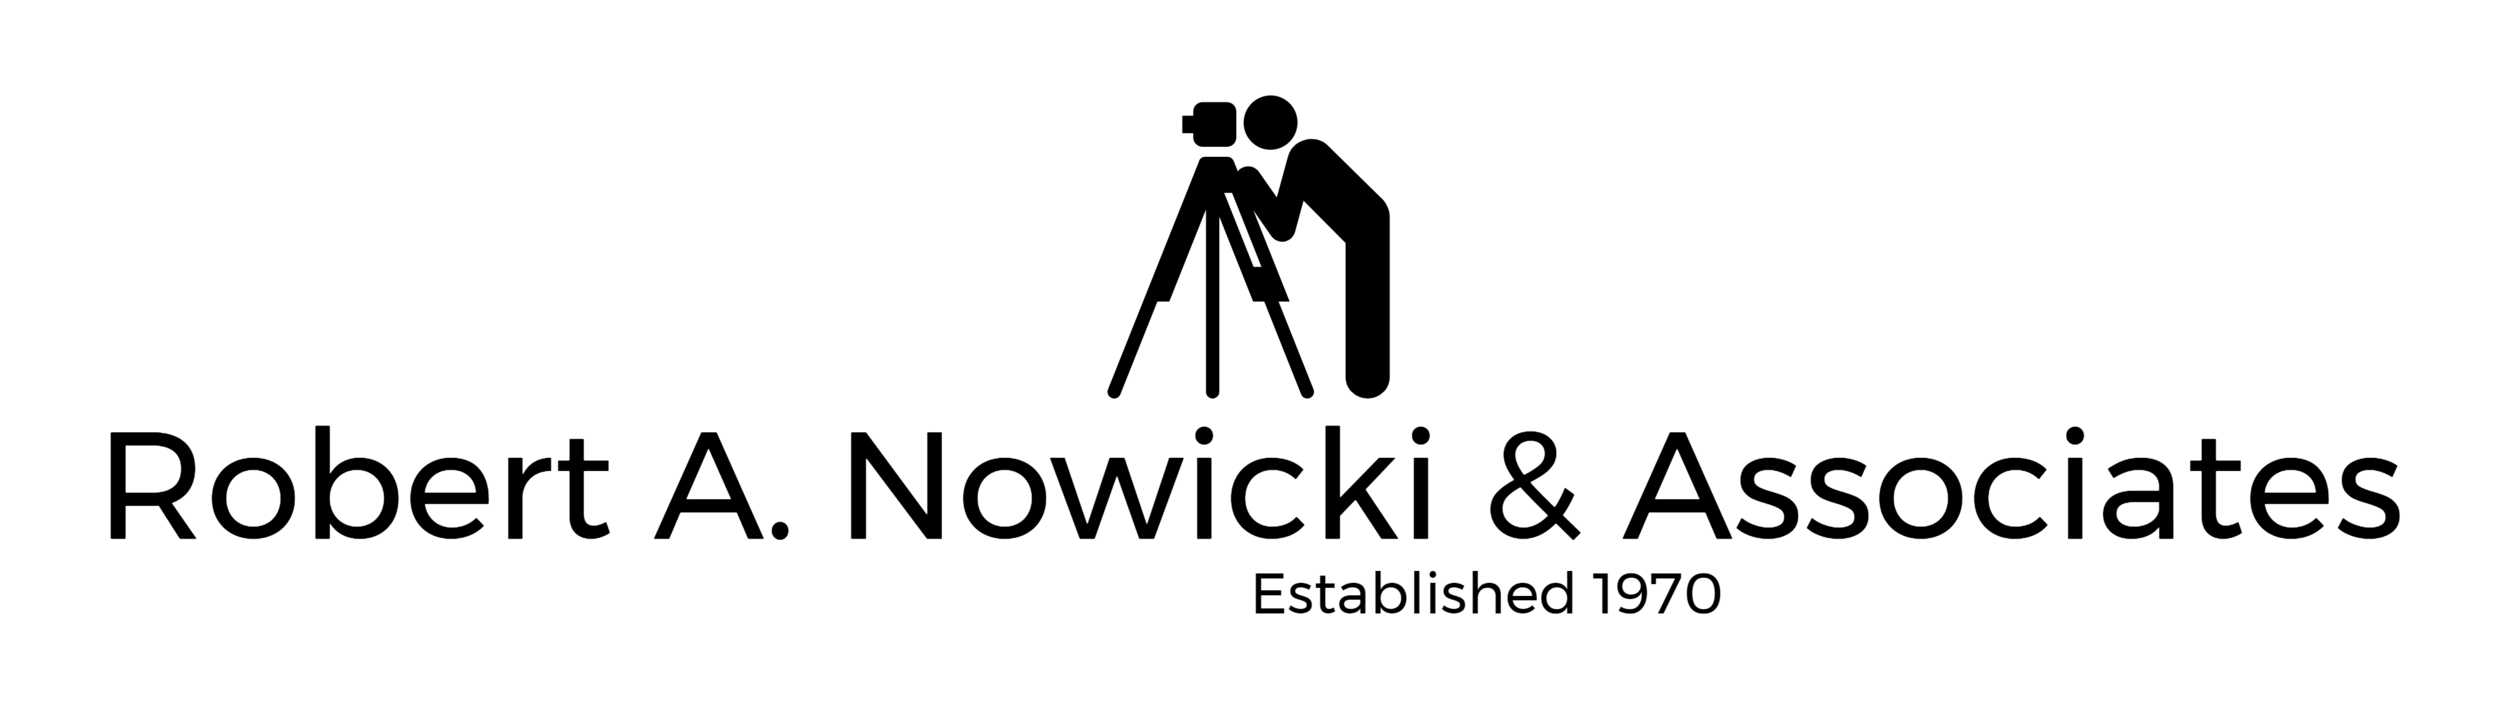 Robert A. Nowicki & Associates-logo-black.png